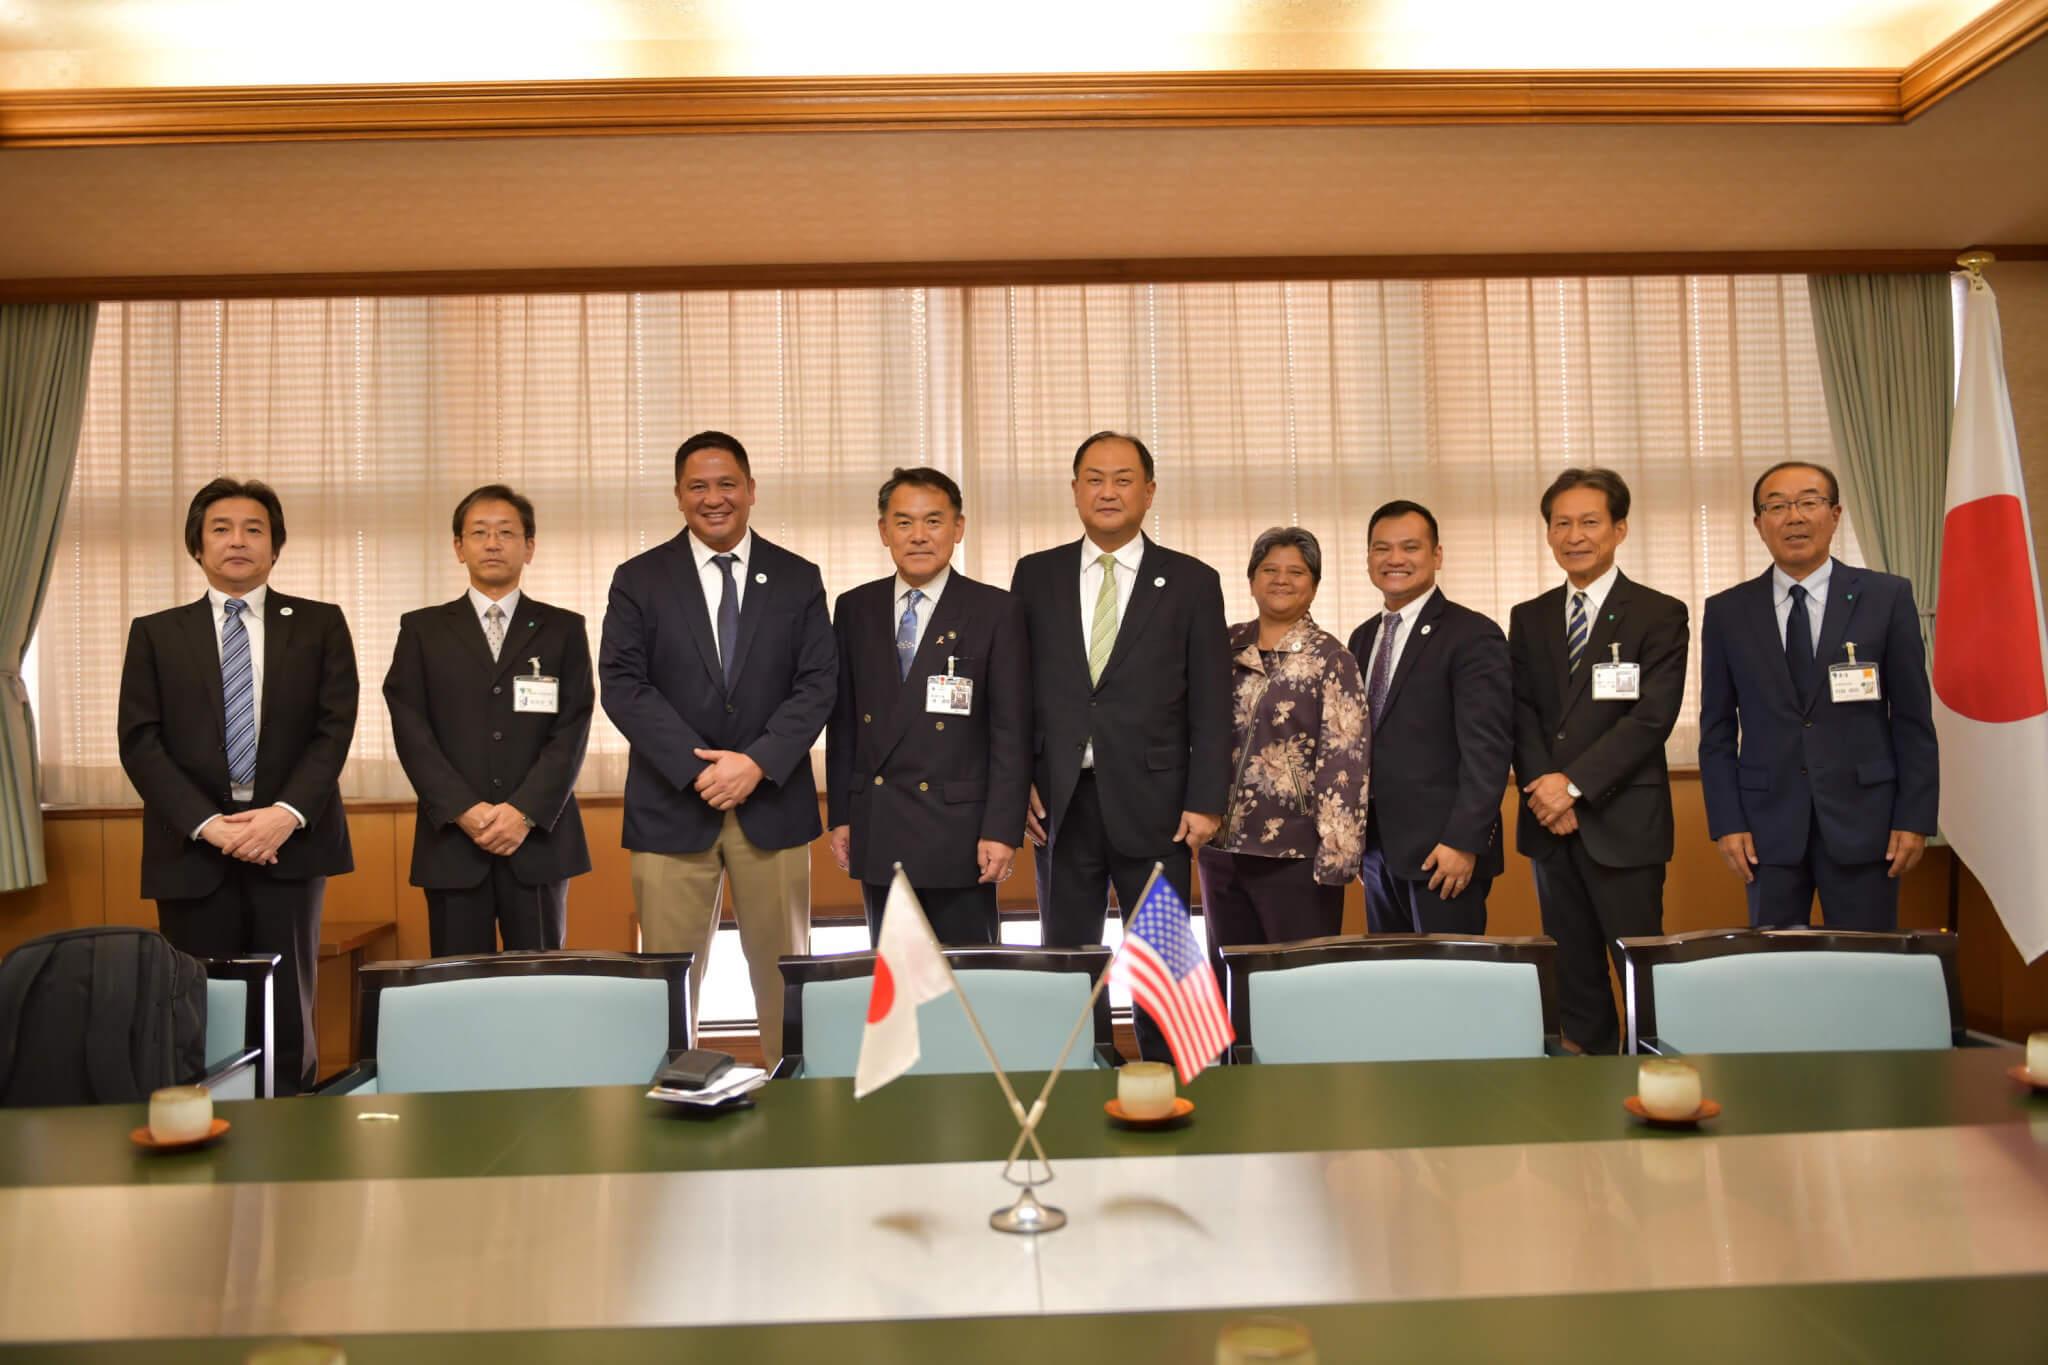 Guam and Karatsu friendship strengthened in Japan